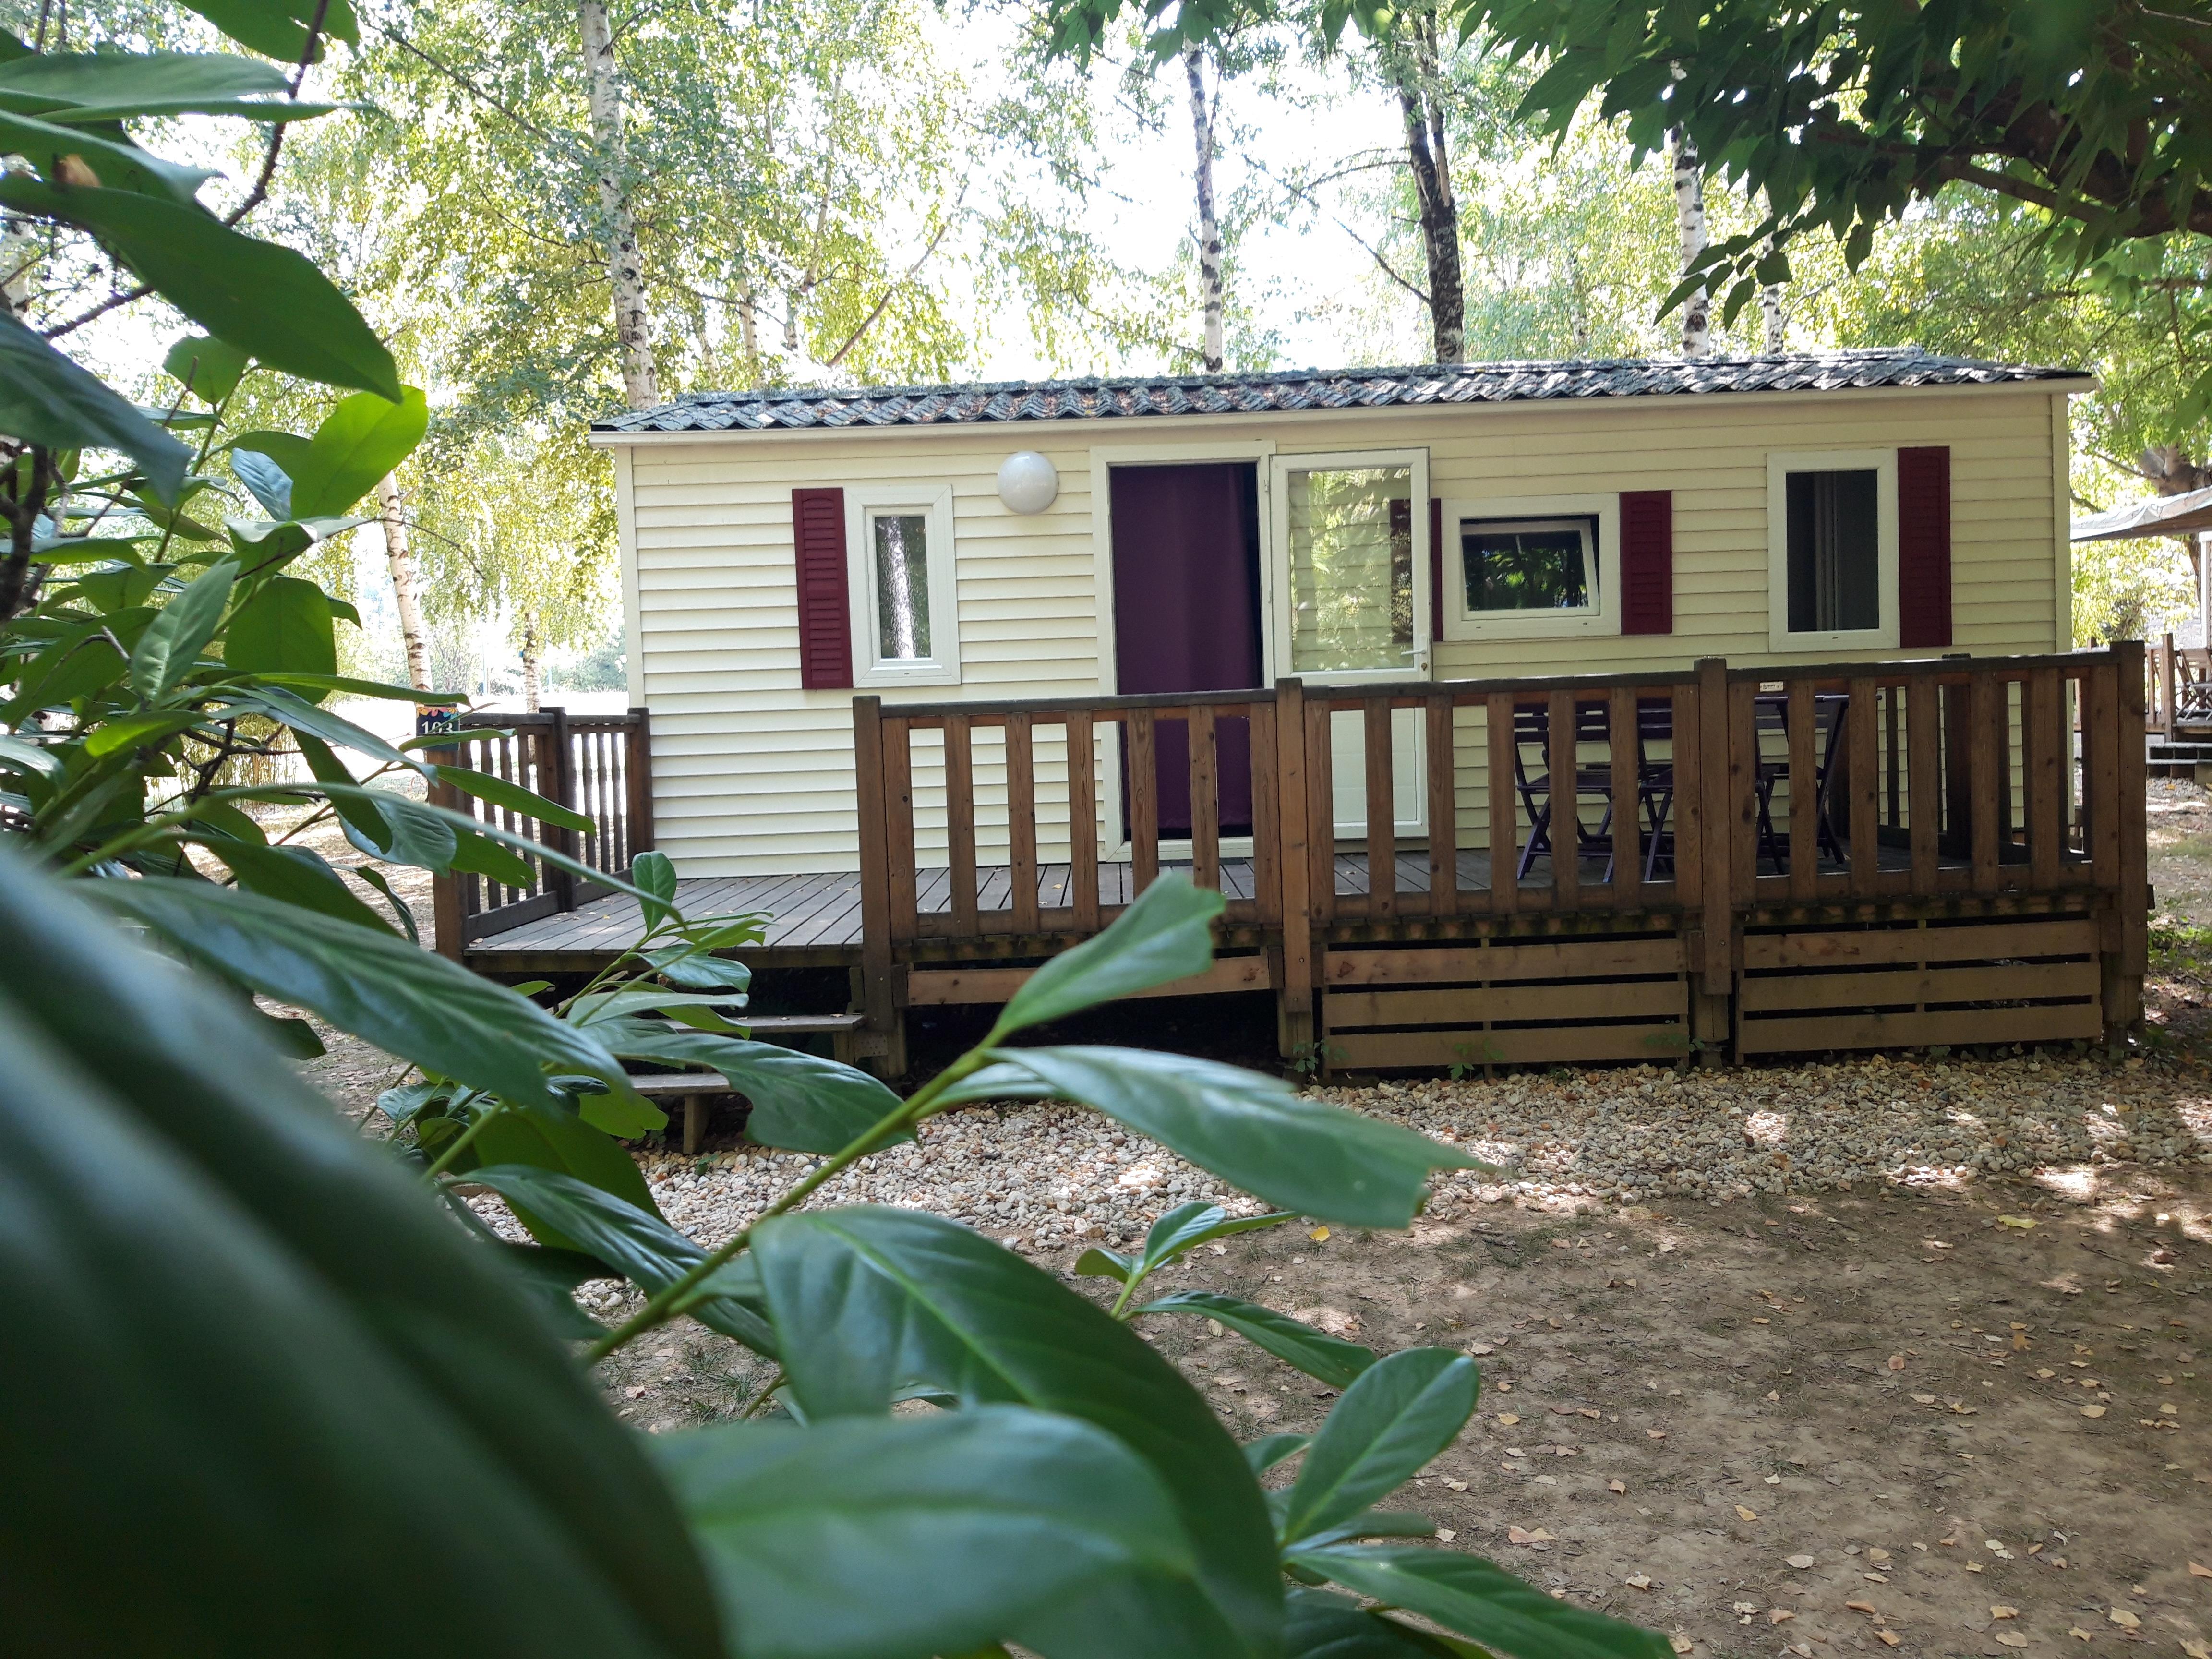 Location - Mobilhome P'tit Budget (2 Chambres) - Flower Camping Les Gorges de l'Aveyron